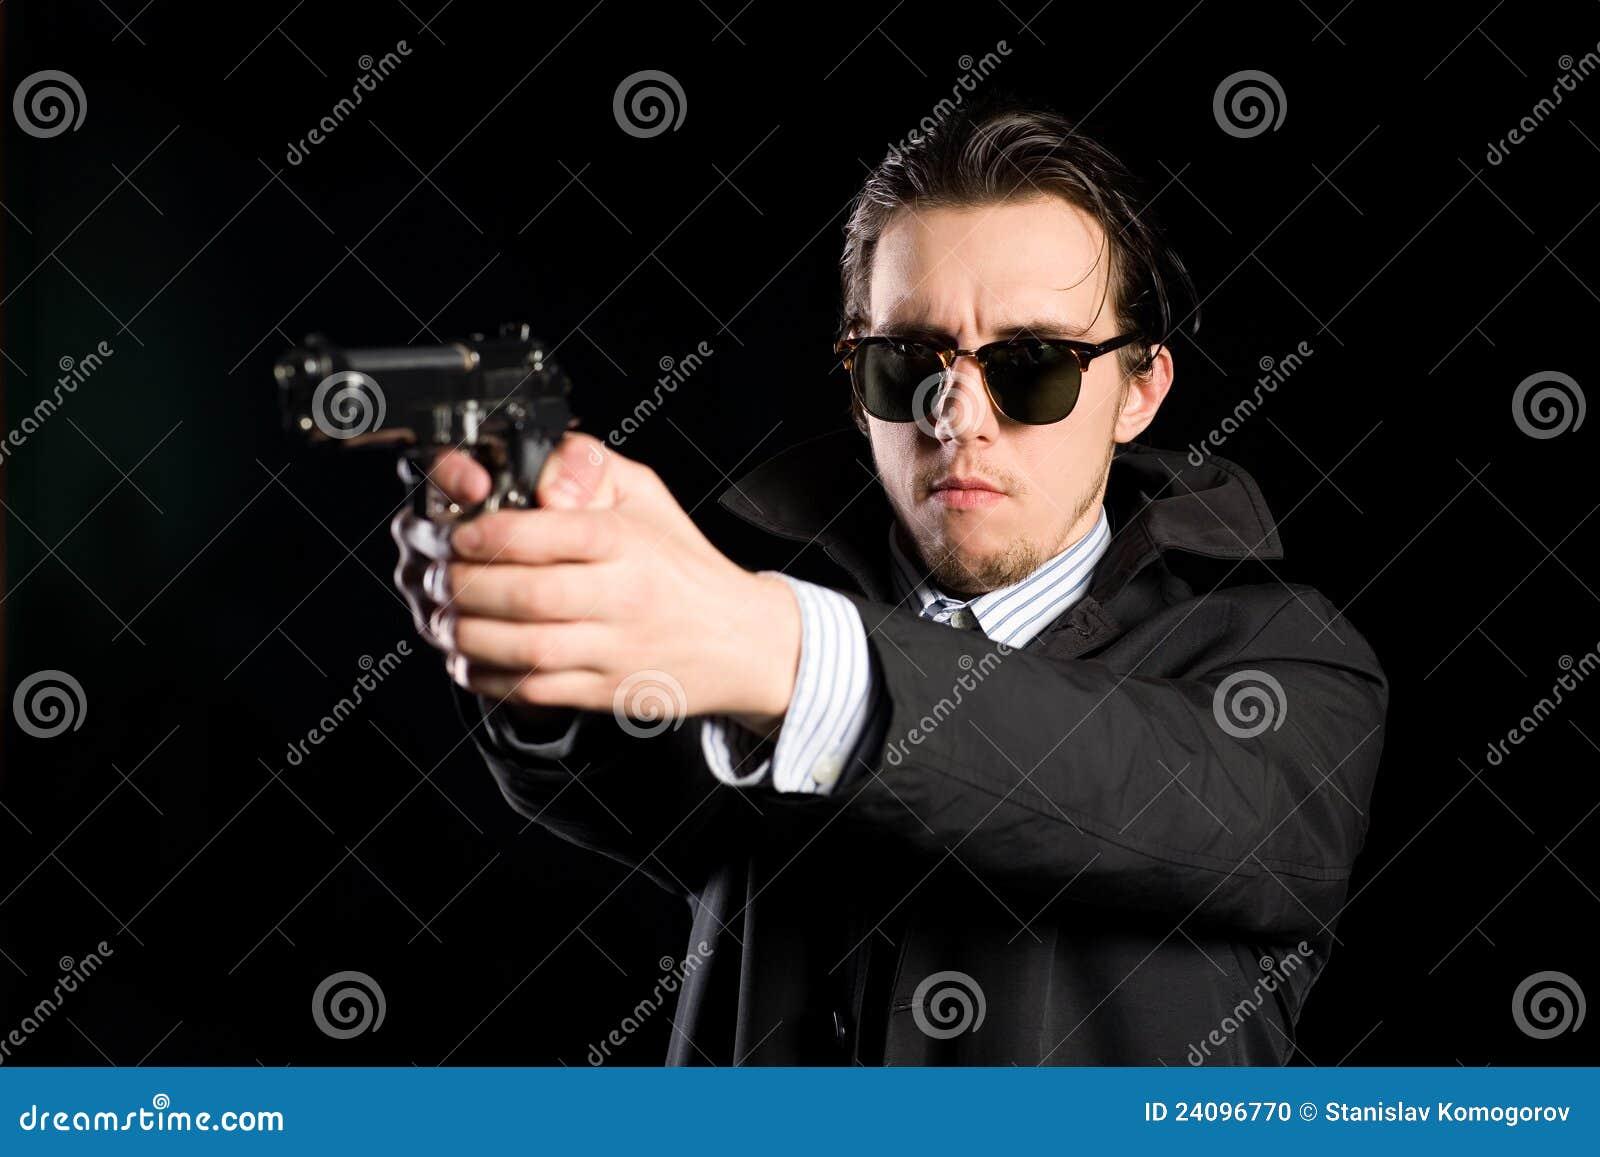 Man Shooting A Gun Stock Photo Image 24096770